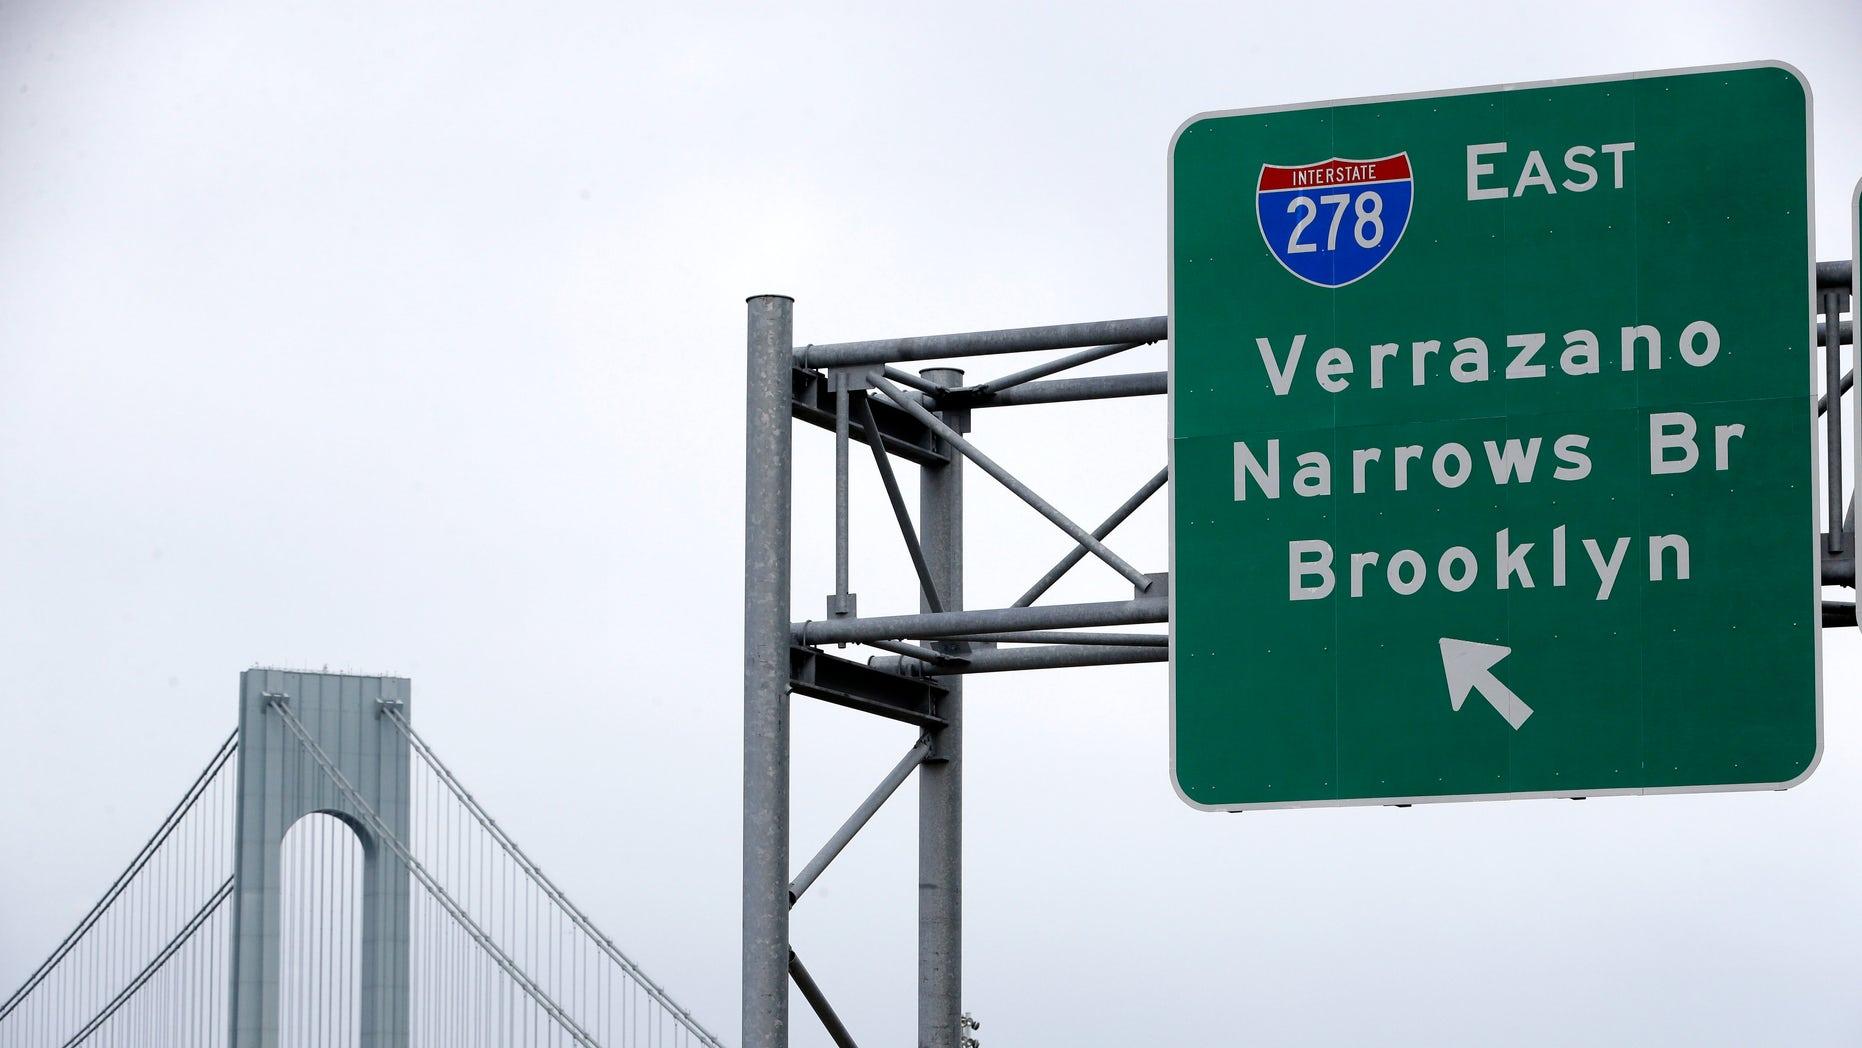 A road sign indicating an entrance to the Verrazano-Narrows Bridge.